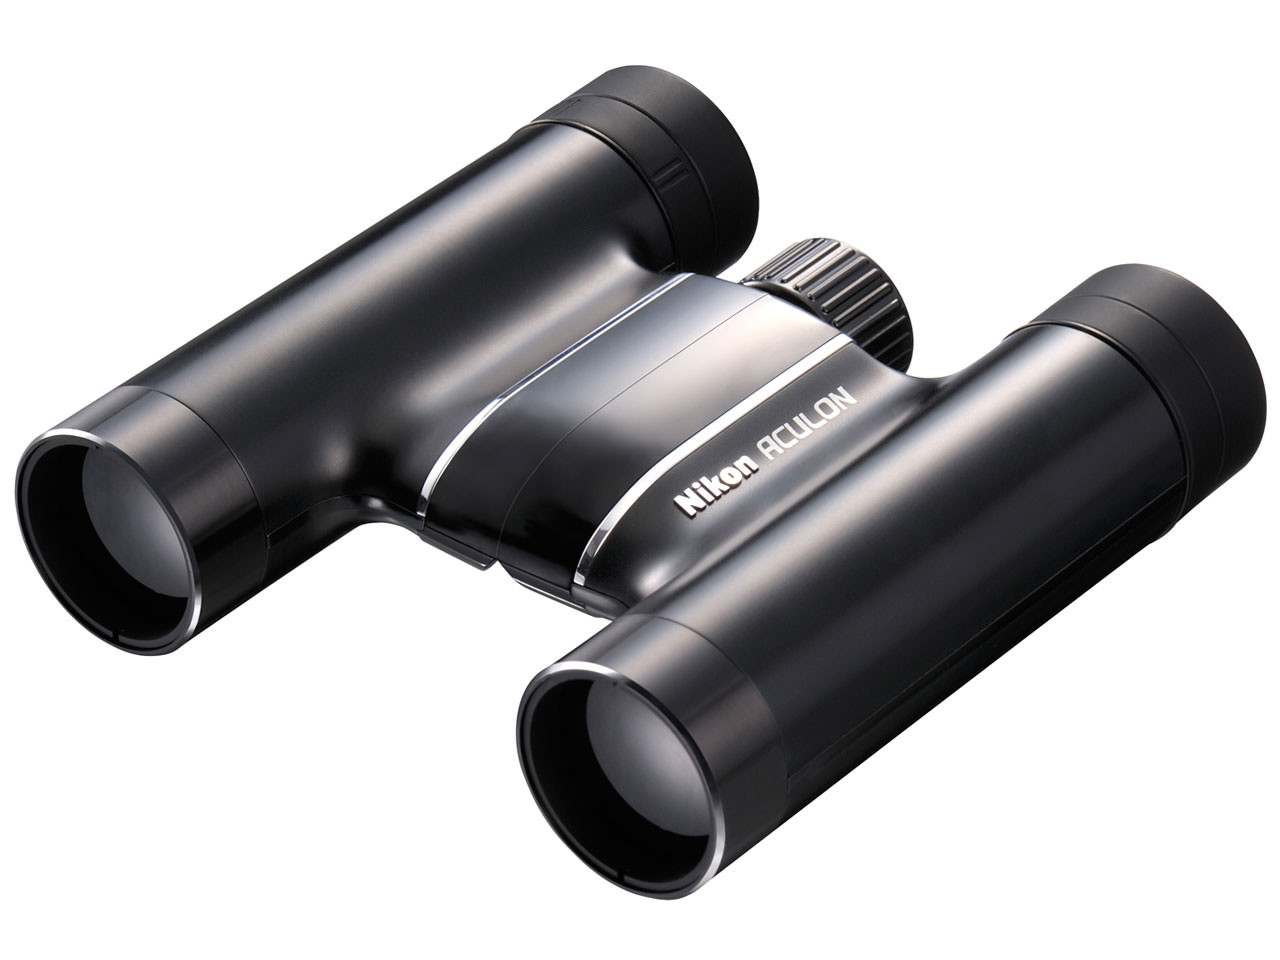 Nikon ACULON T51 8x24